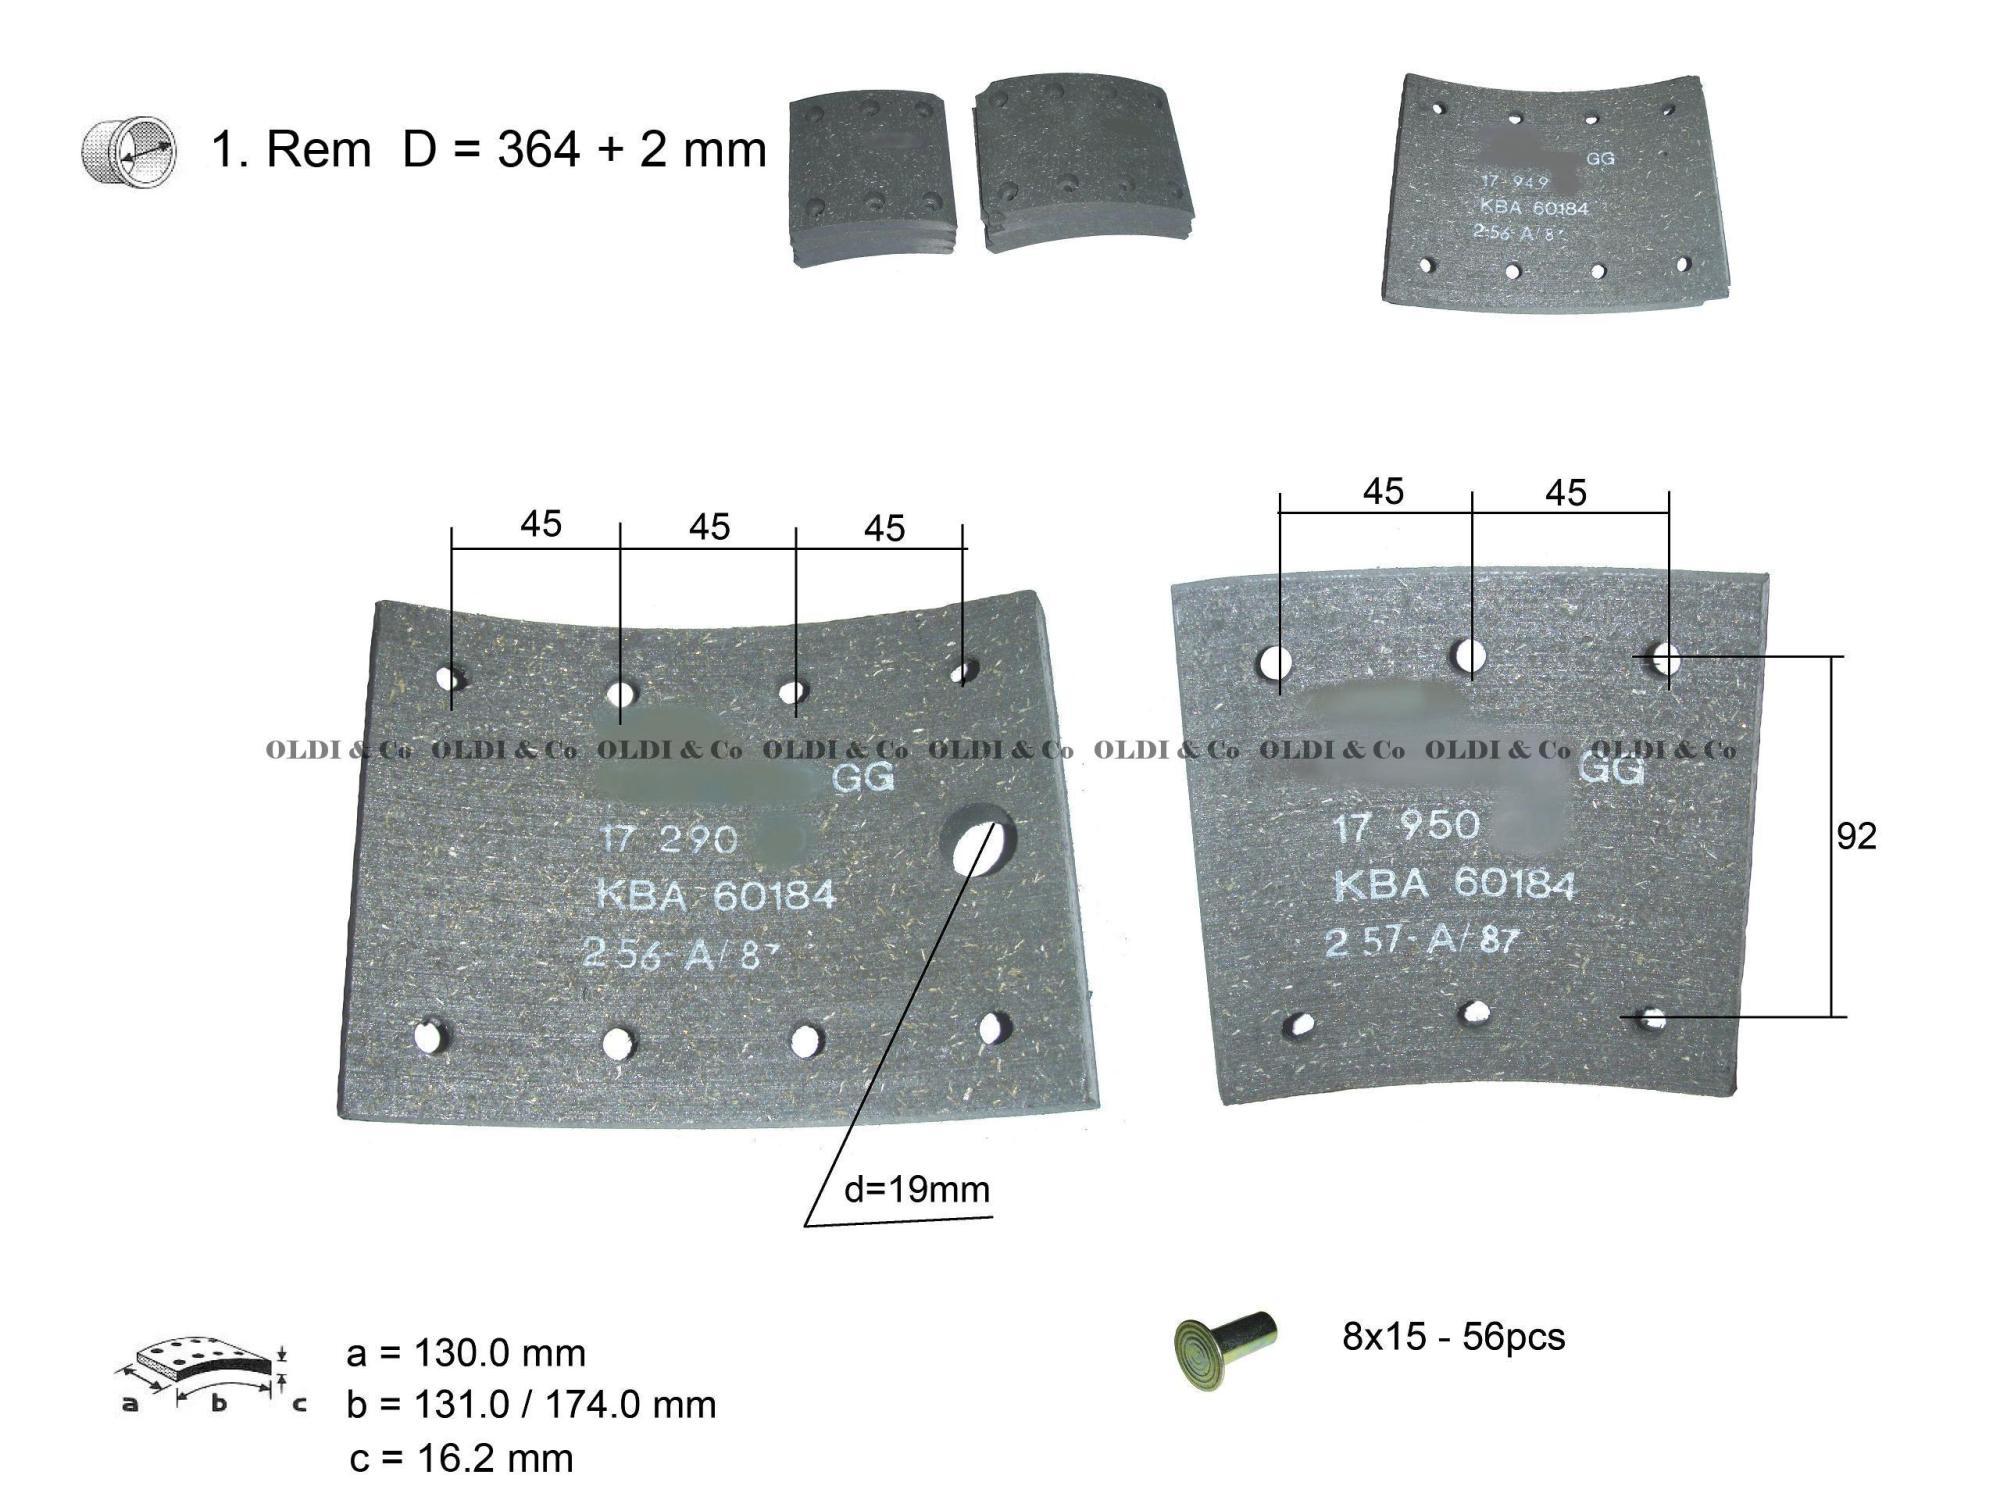 hight resolution of 11 037 09519 details of brake system brake lining kit brem u sist mas deta as